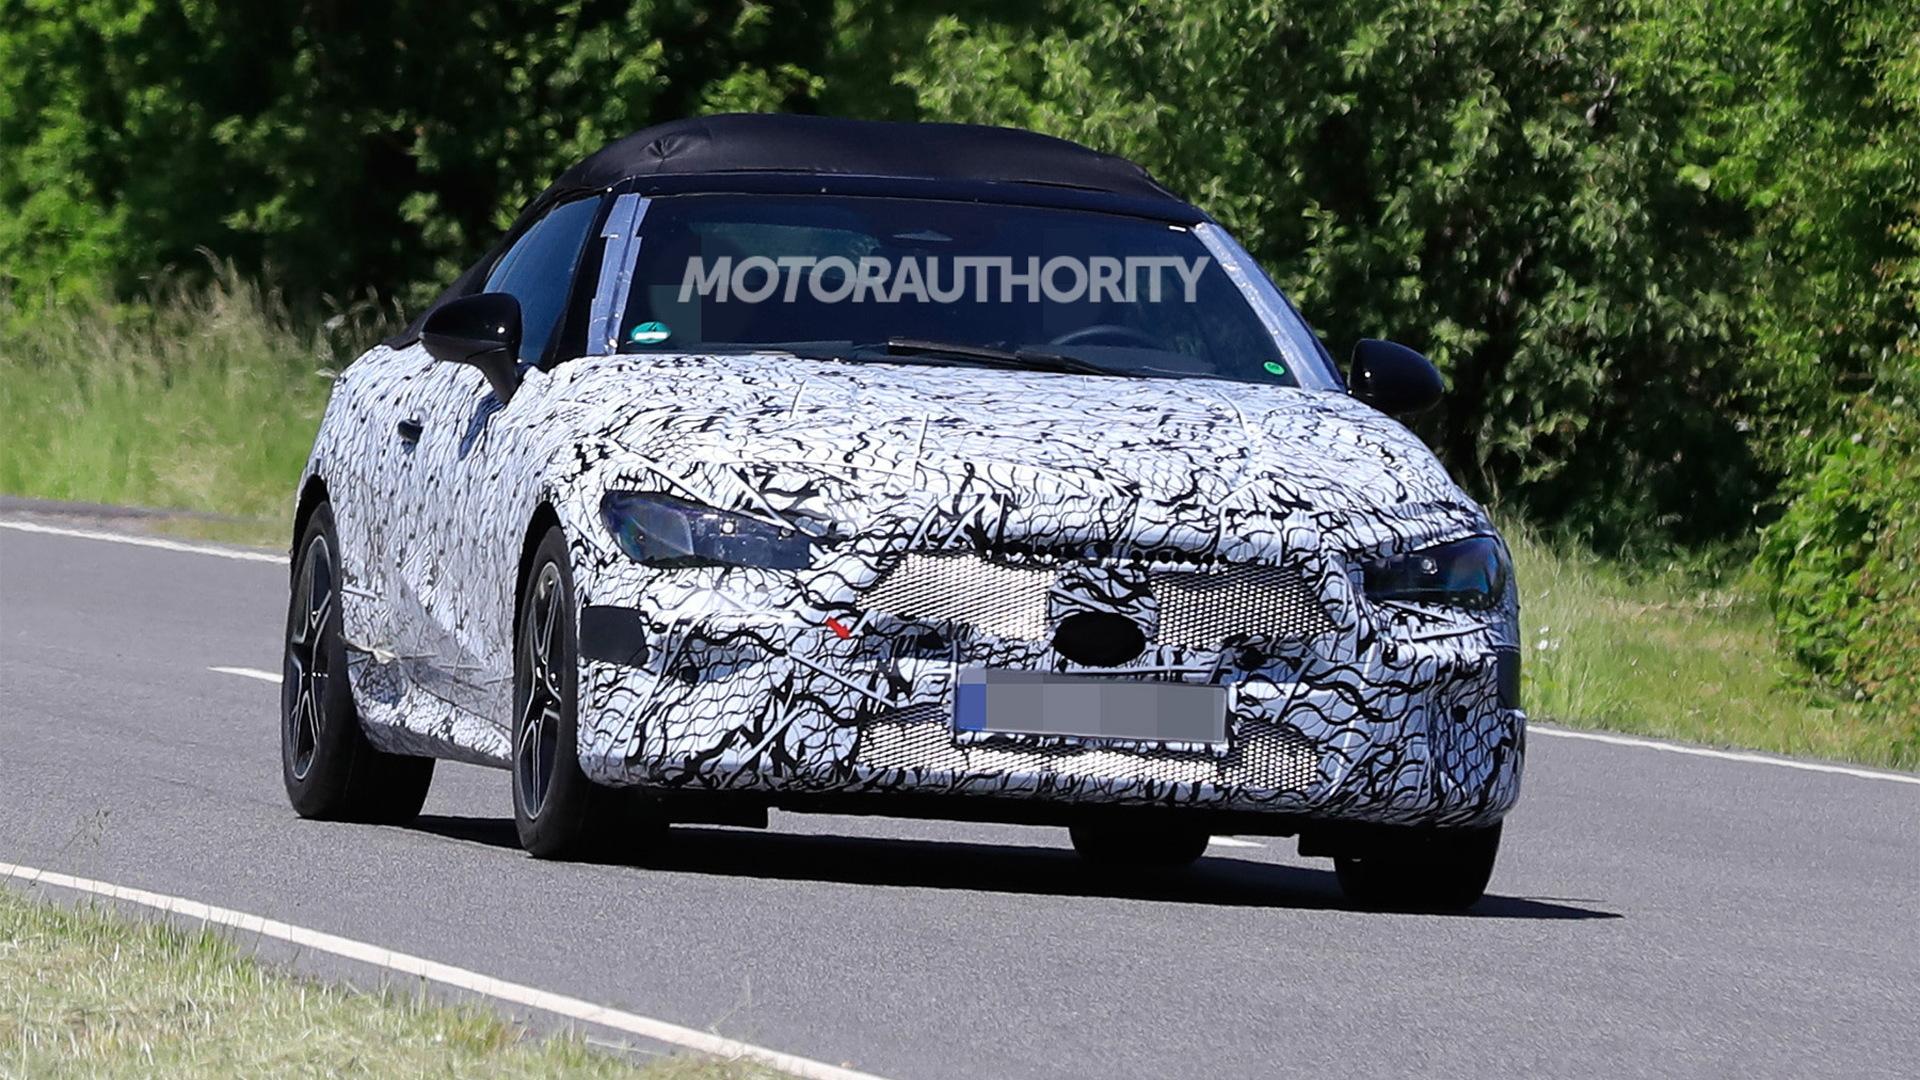 2023 Mercedes-Benz C-Class Cabriolet spy shots - Photo credit:S. Baldauf/SB-Medien